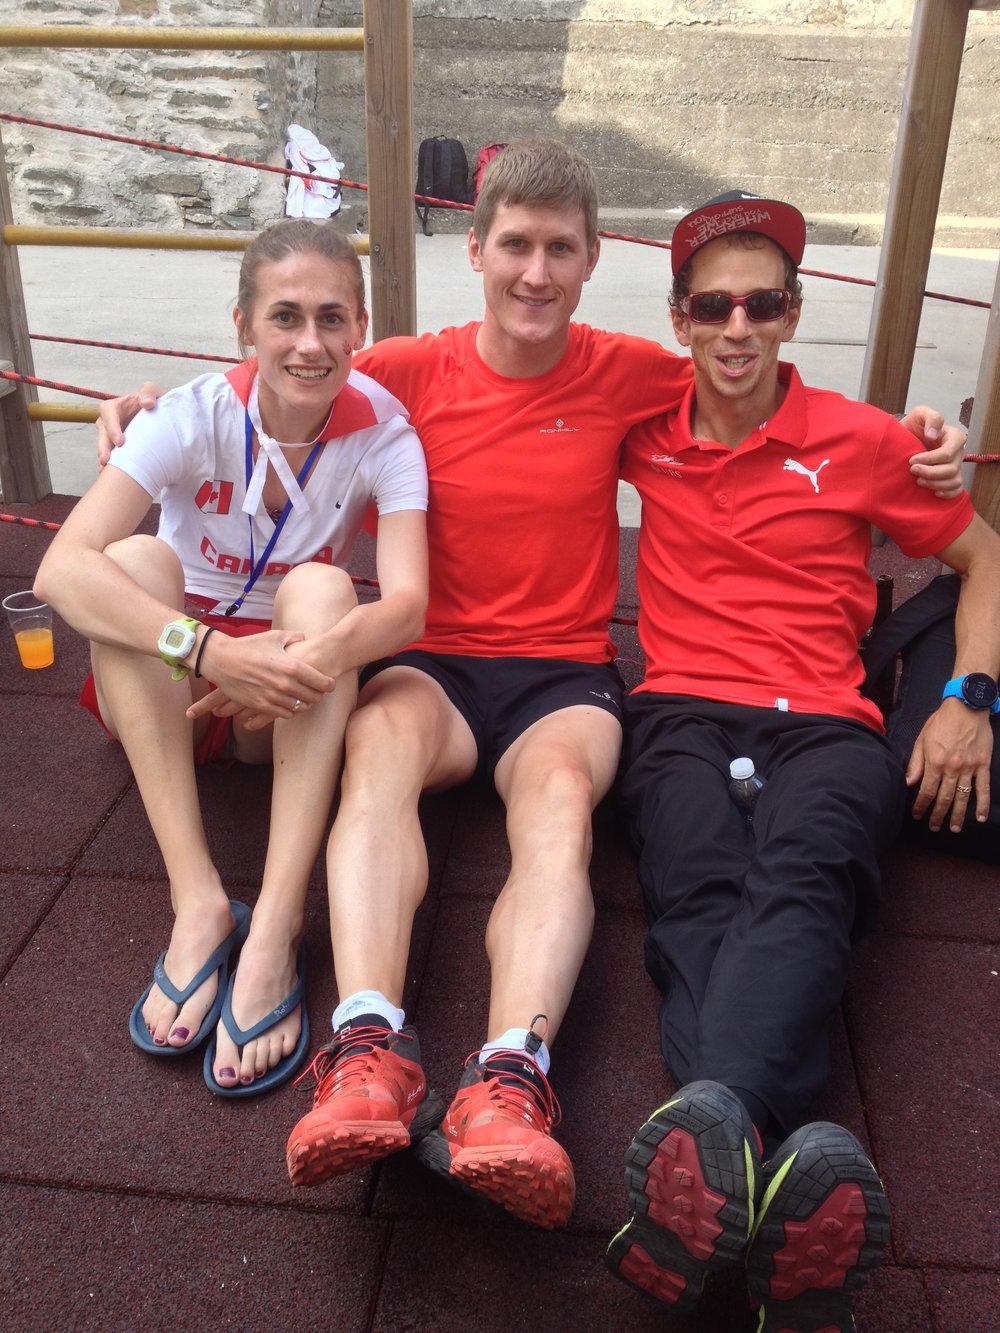 Adele Blaise-Sohnius, Matt Setlack and Francois Leboeuf